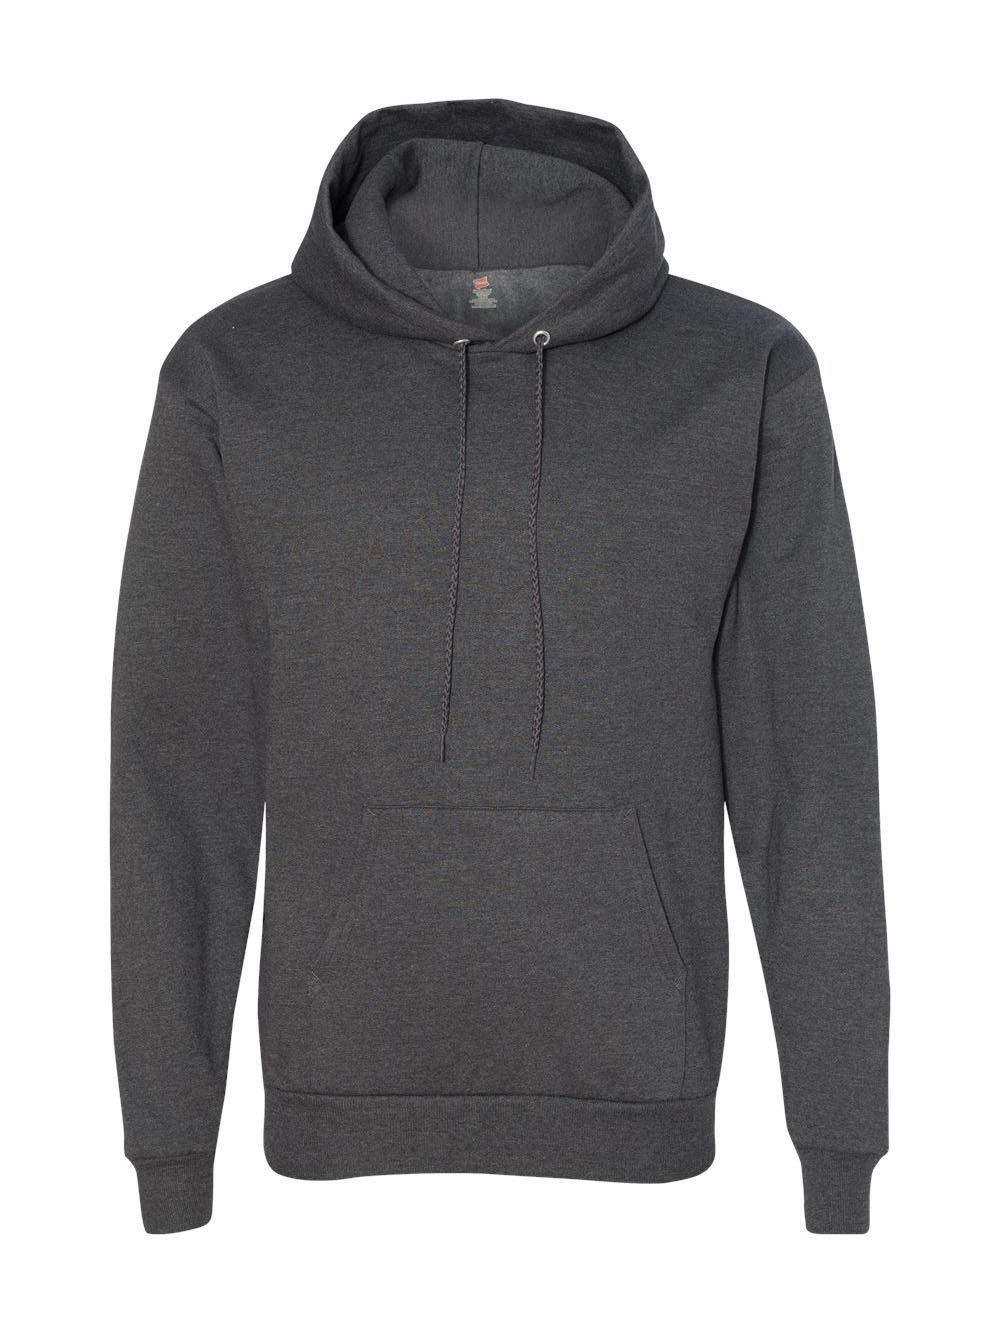 Hanes Men's Pullover EcoSmart Fleece Hooded Sweatshirt, Charcoal Heather, 4X Large